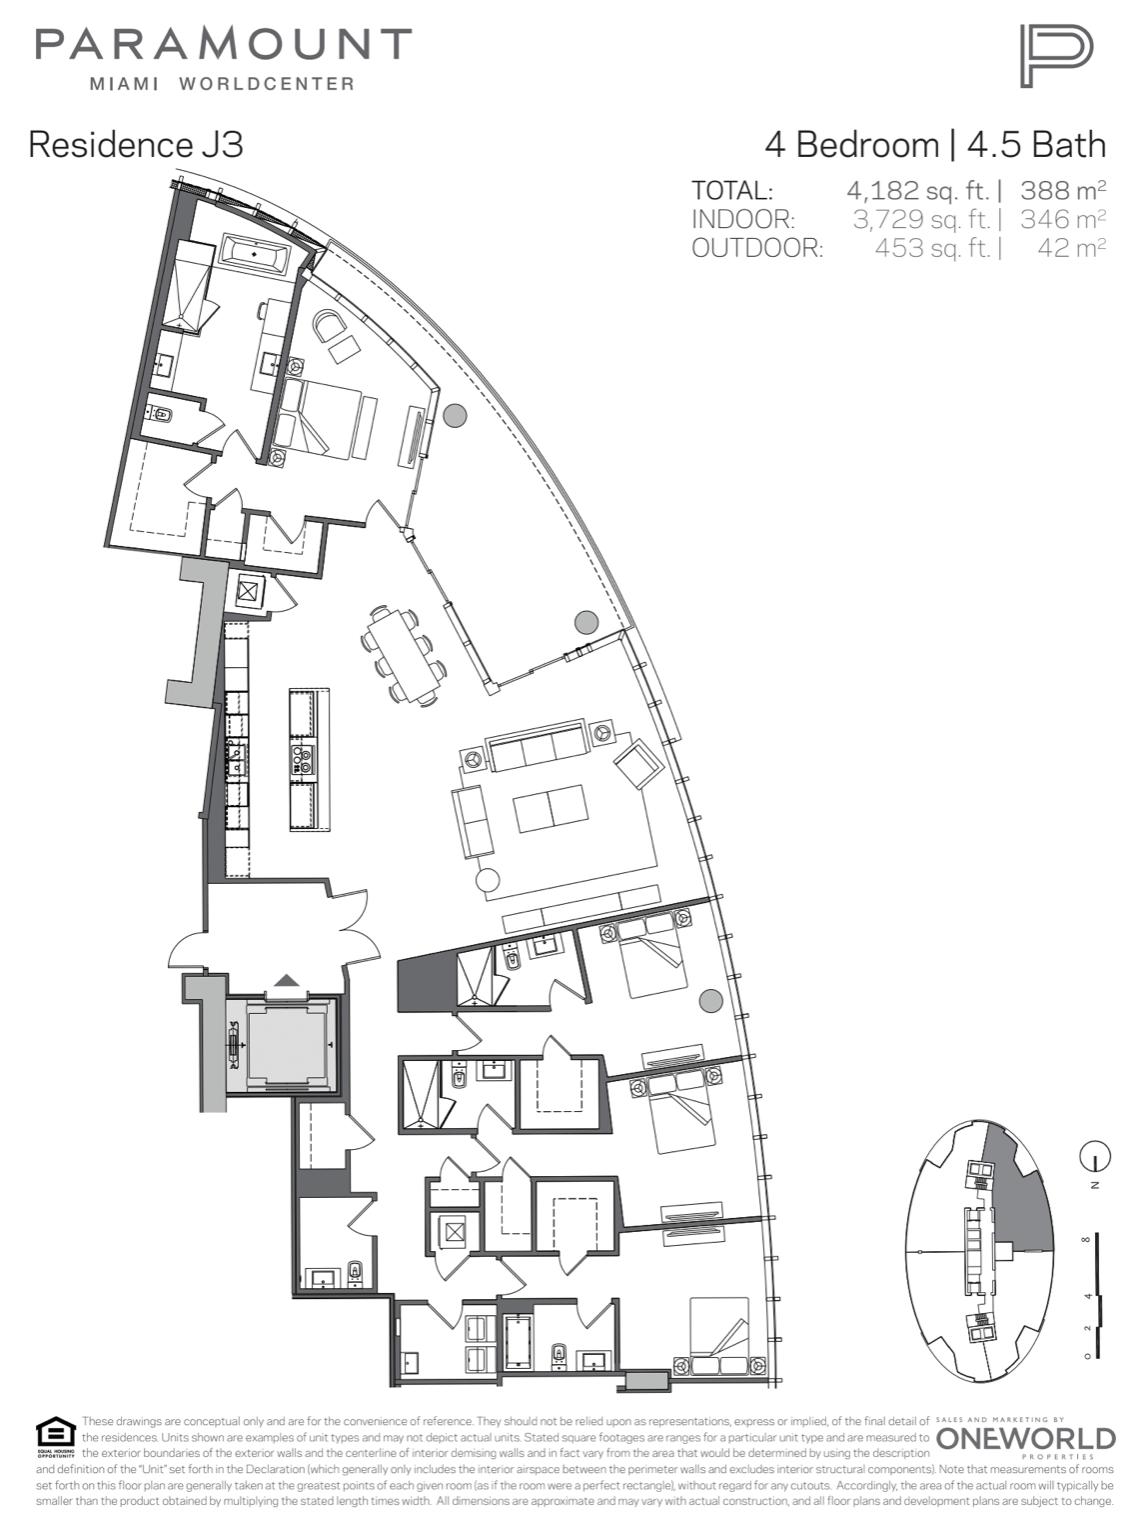 PMWC Penthouse J3